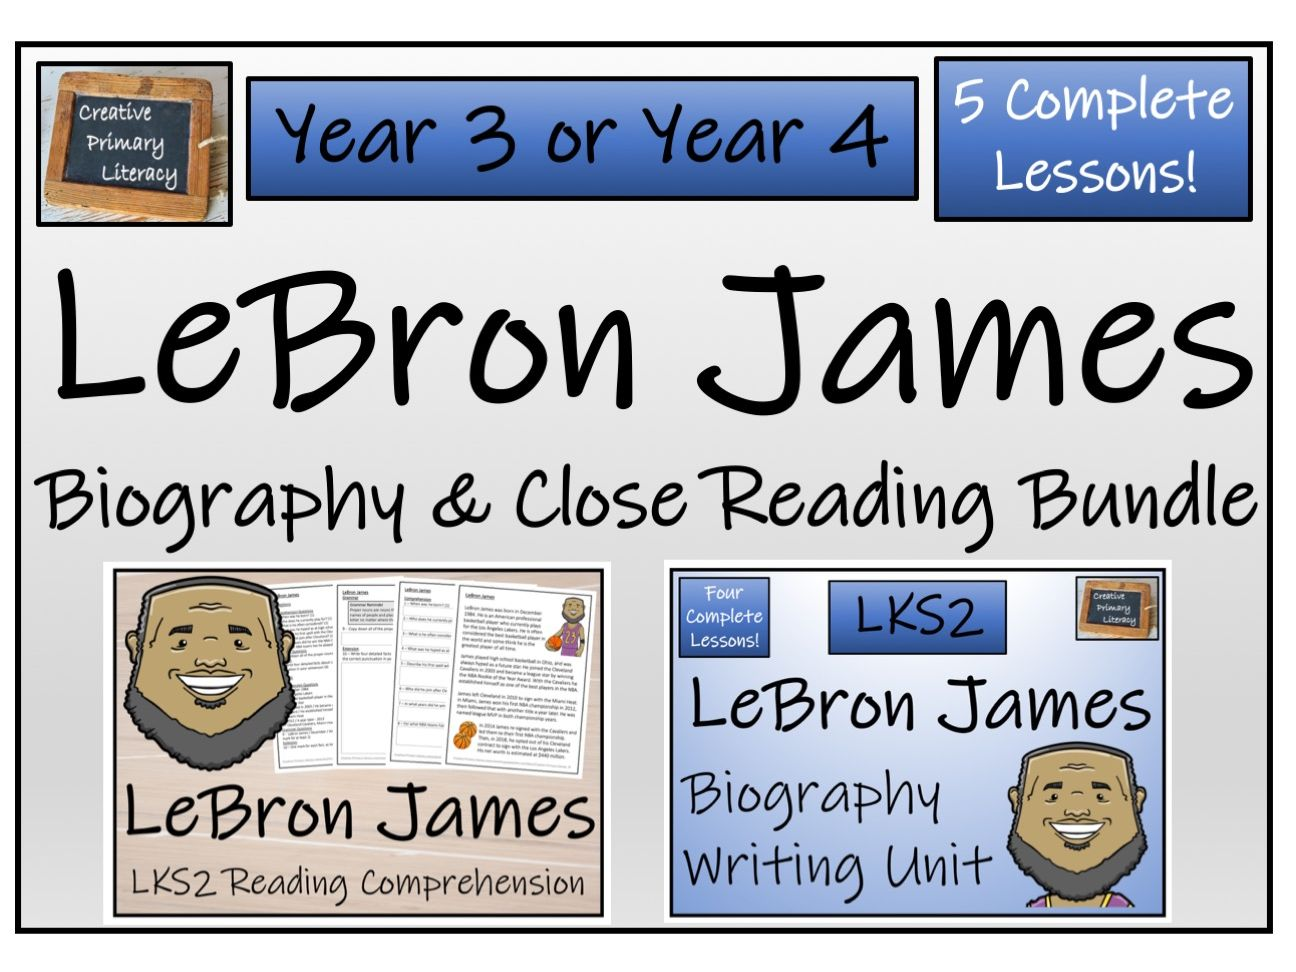 LKS2 Literacy - LeBron James Reading Comprehension & Biography Bundle